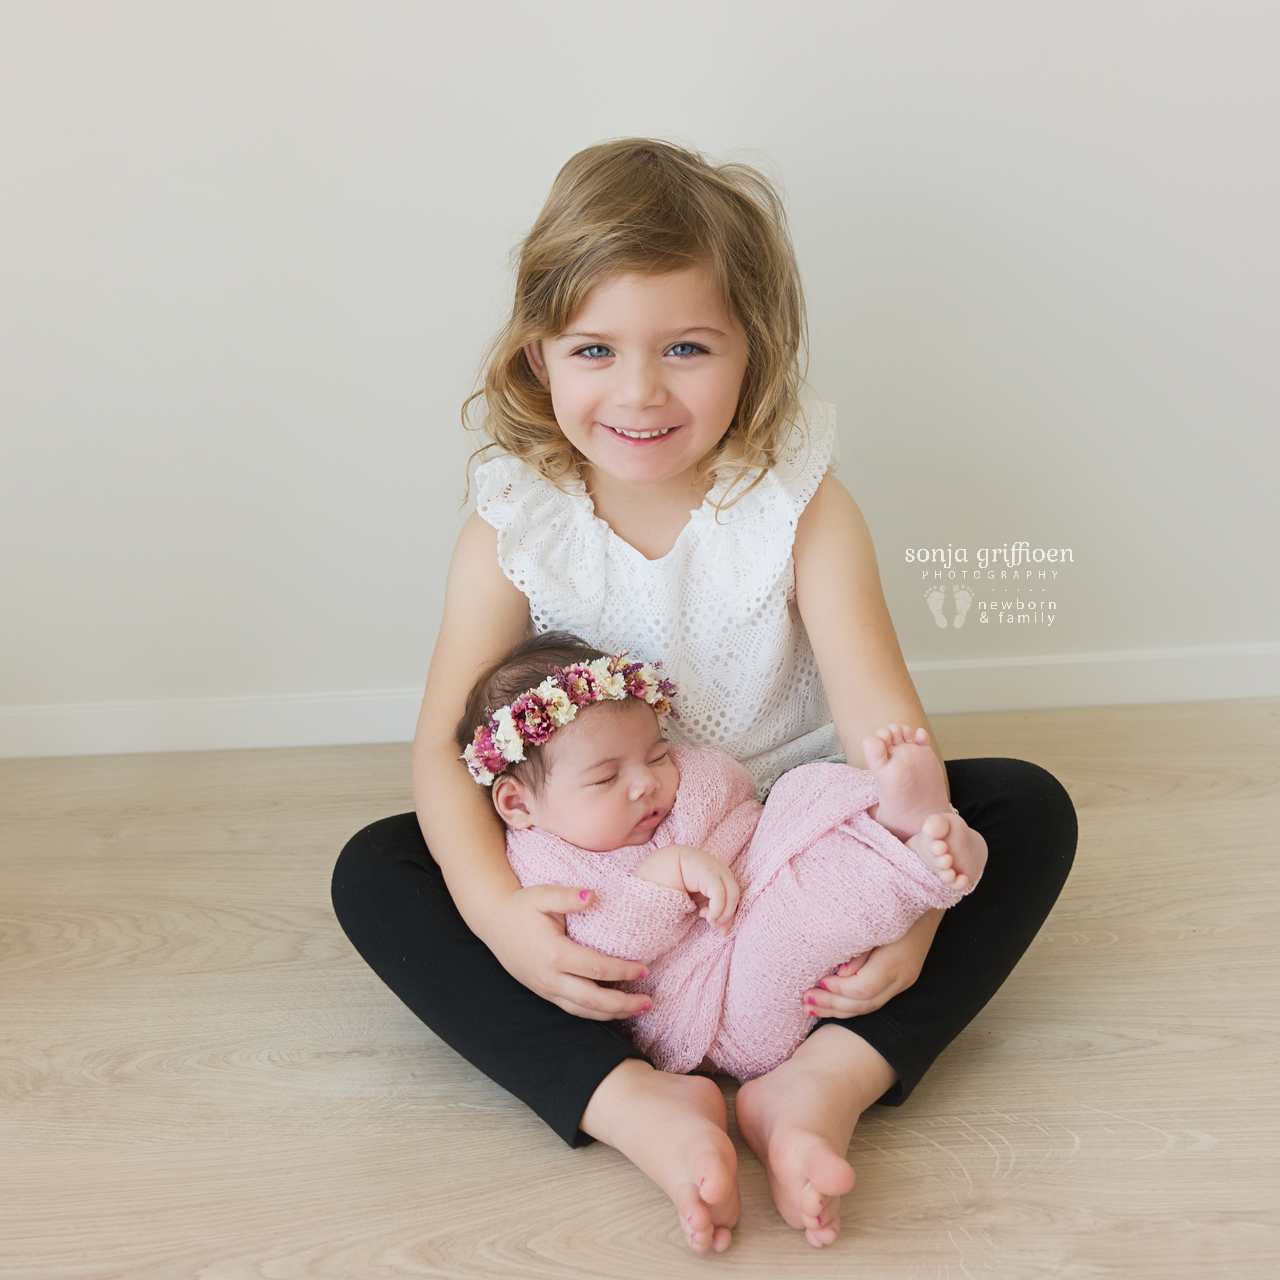 Rumeysa-Newborn-Brisbane-Newborn-Photographer-Sonja-Griffioen-24b.jpg